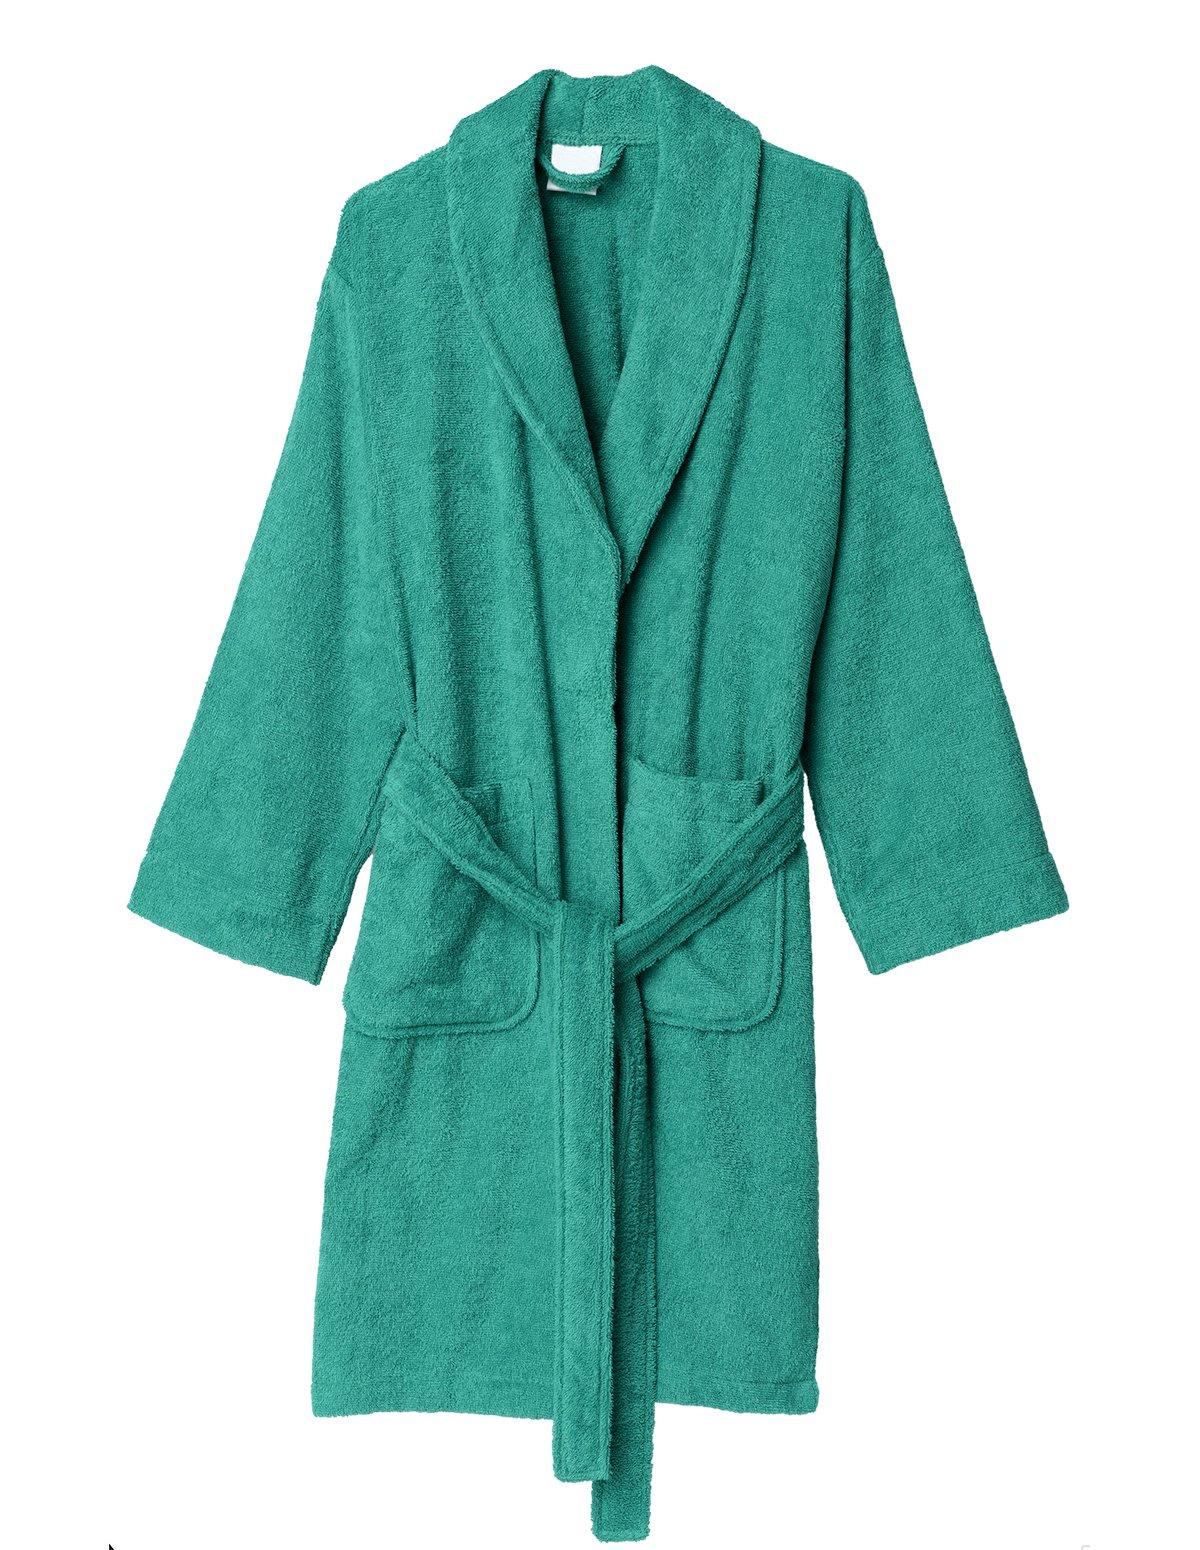 TowelSelections Women's Robe, Turkish Cotton Short Terry Bathrobe Large Arcadia